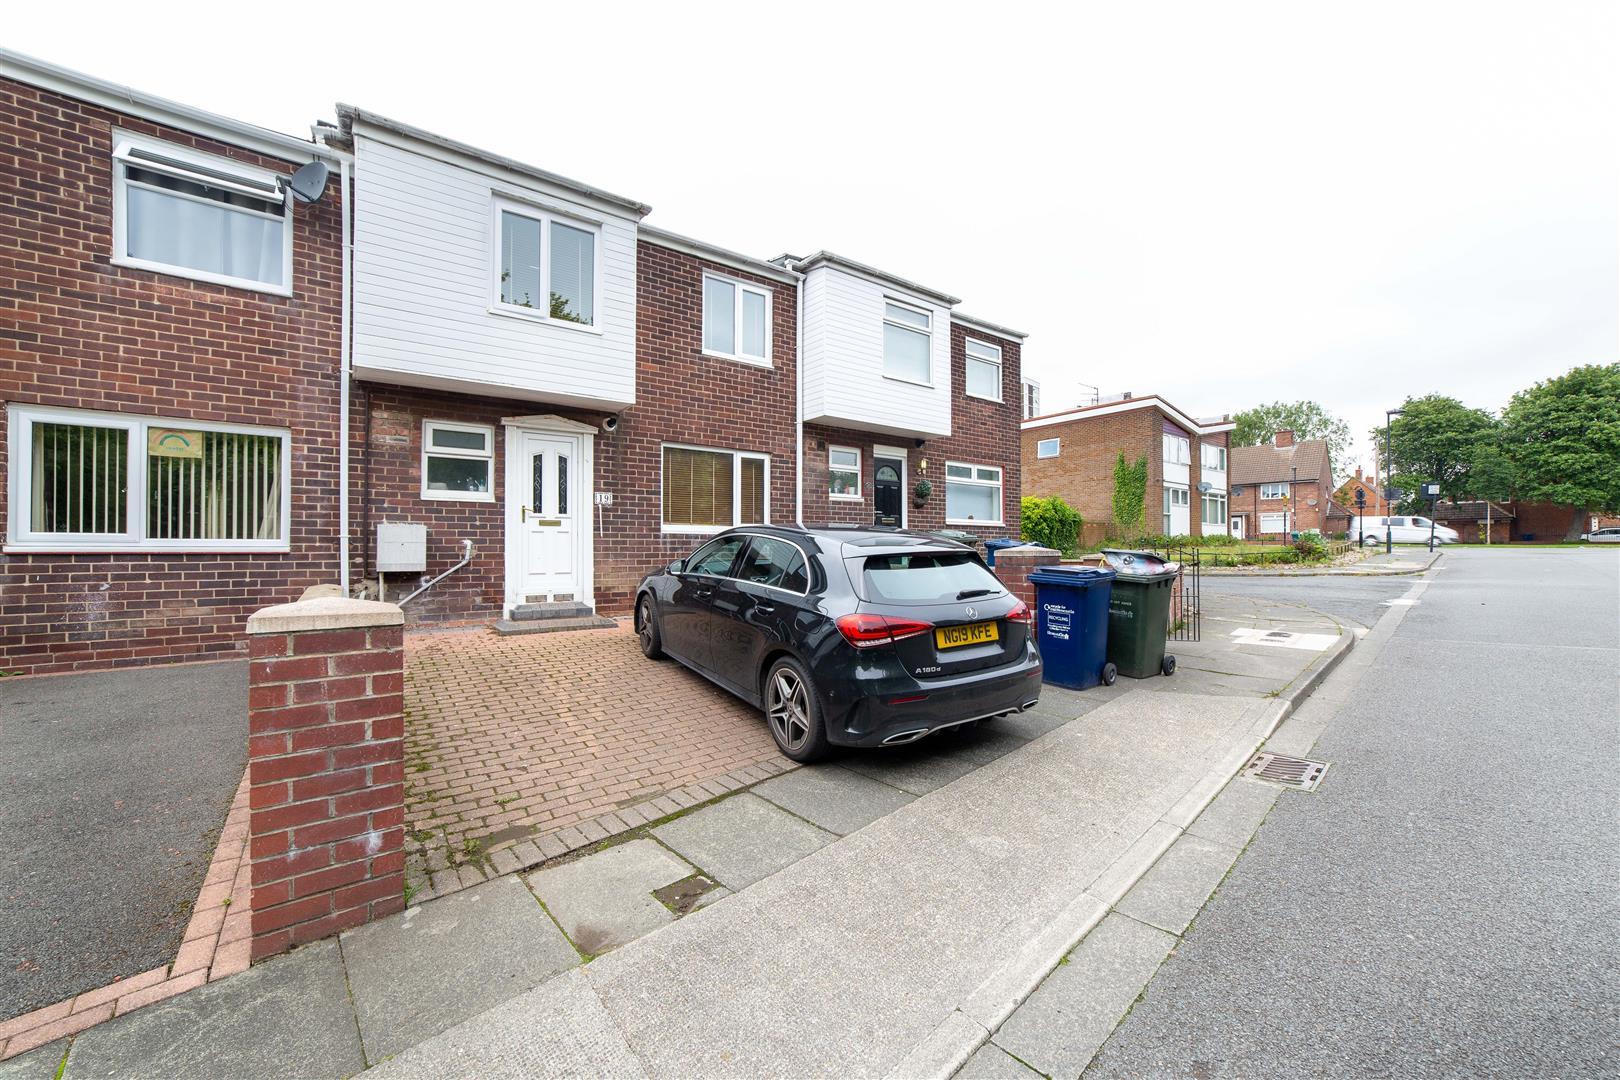 3 bed terraced house to rent in Newcastle Upon Tyne, NE2 1YE, NE2